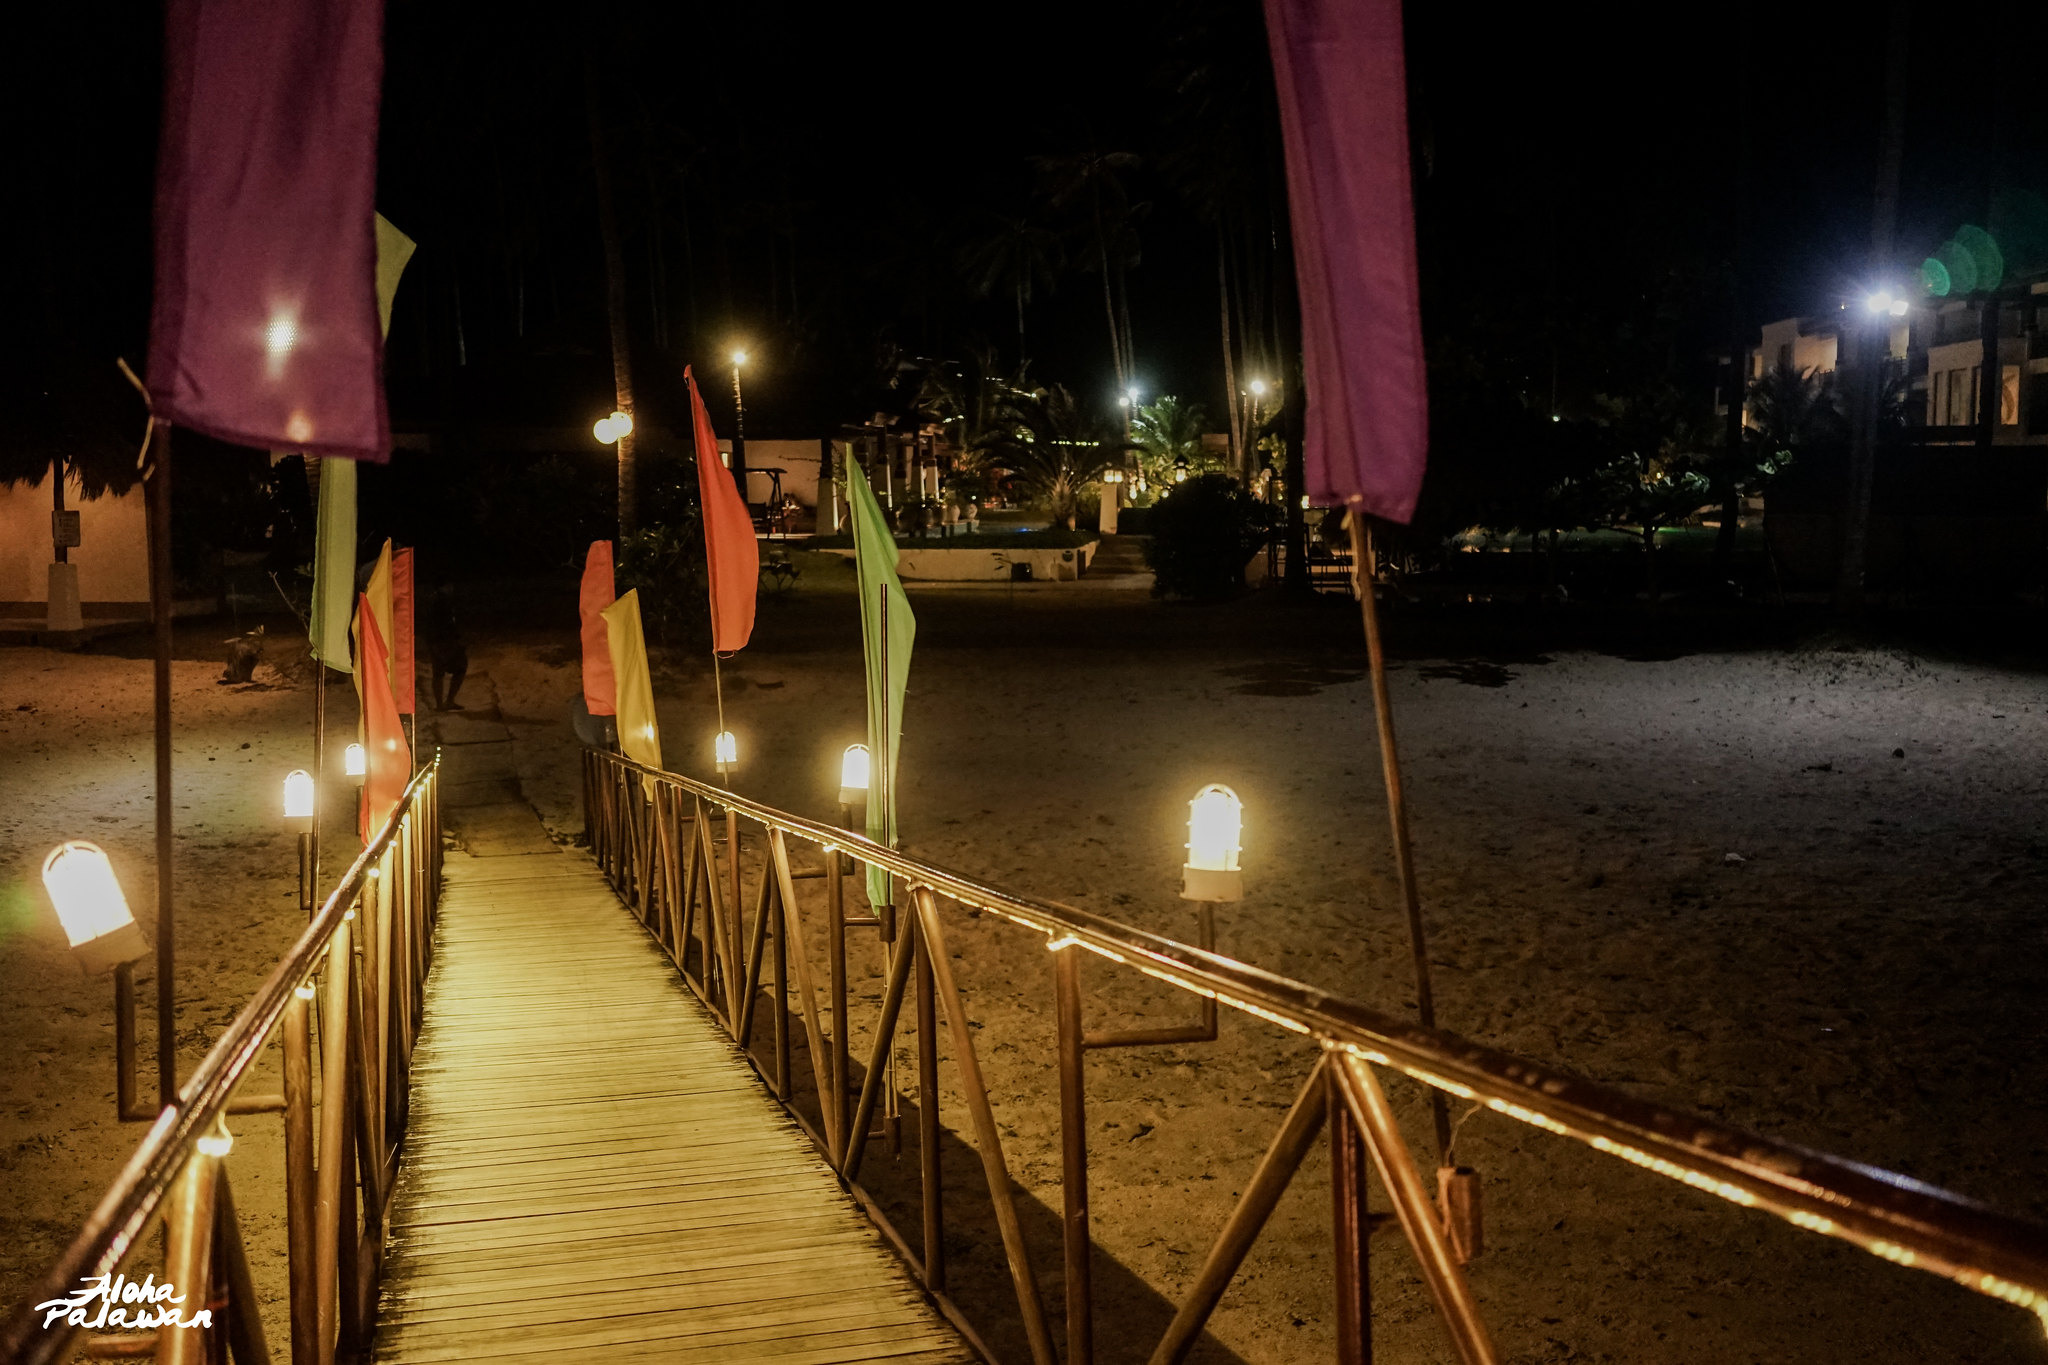 ruthdelacruz | Travel and Lifestyle Blog : Aloha Palawan: A Weekend ...